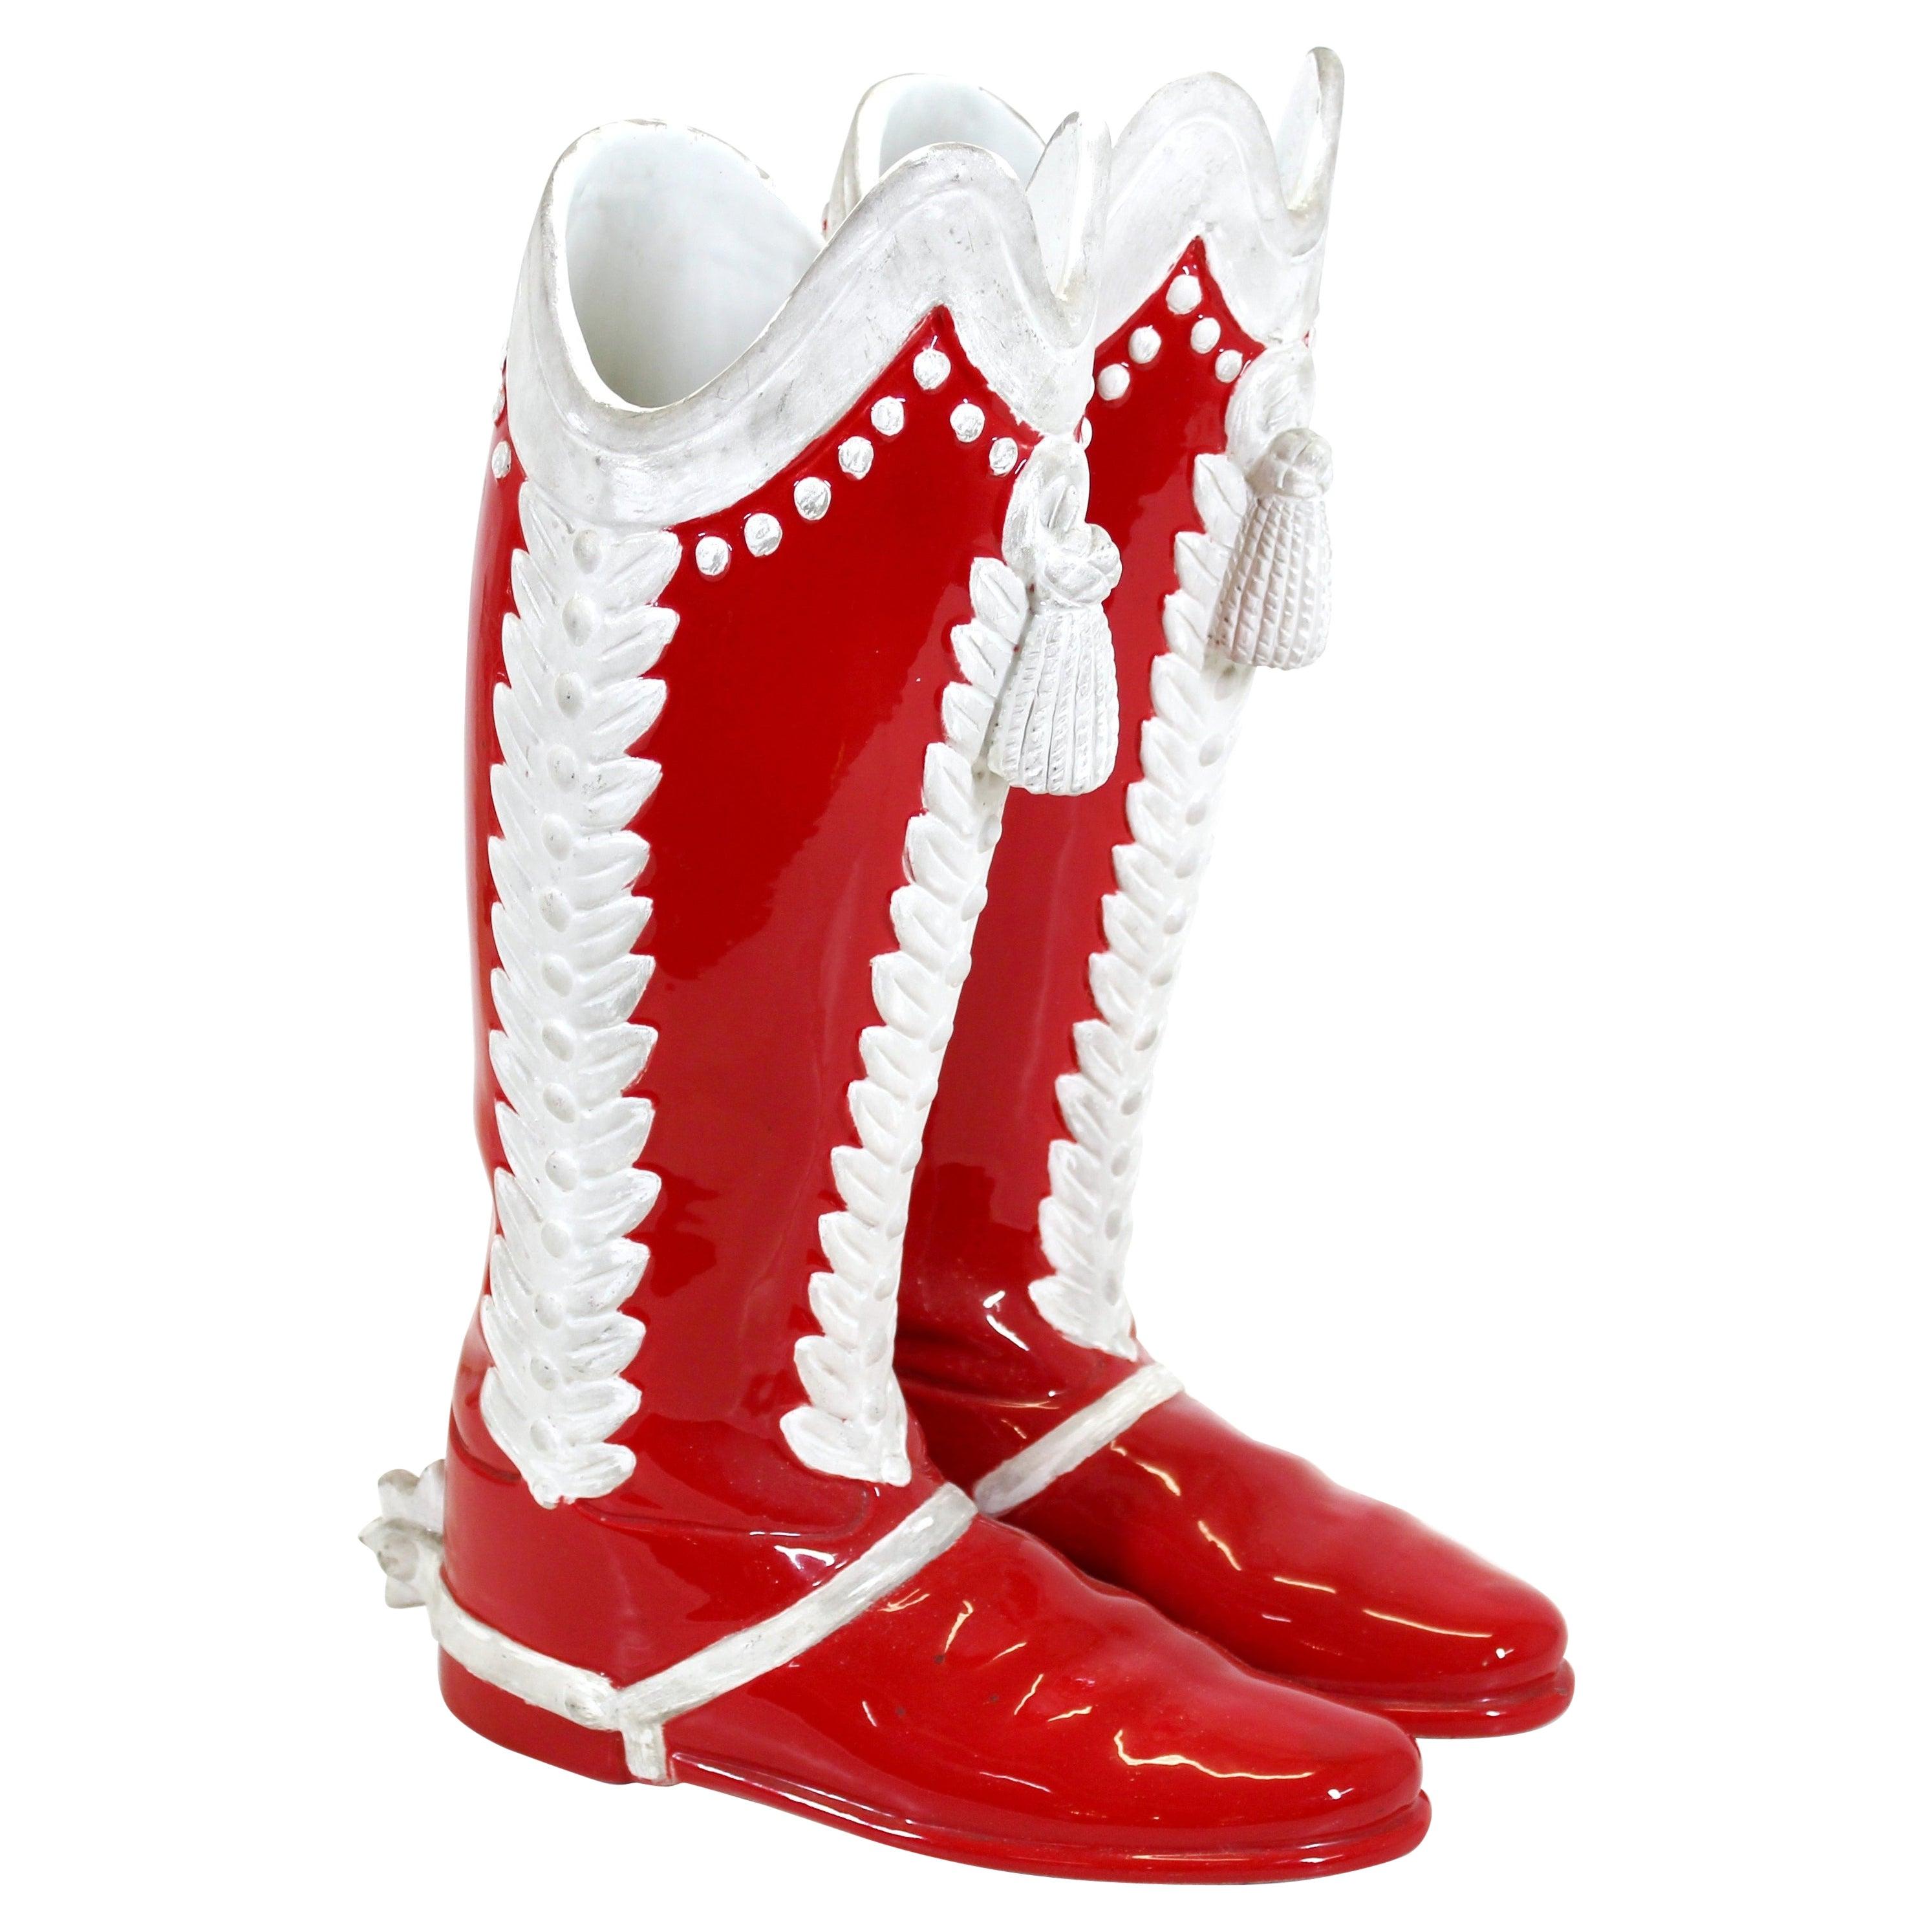 Italian Mid-Century Modern Ceramic Boots Umbrella Stand